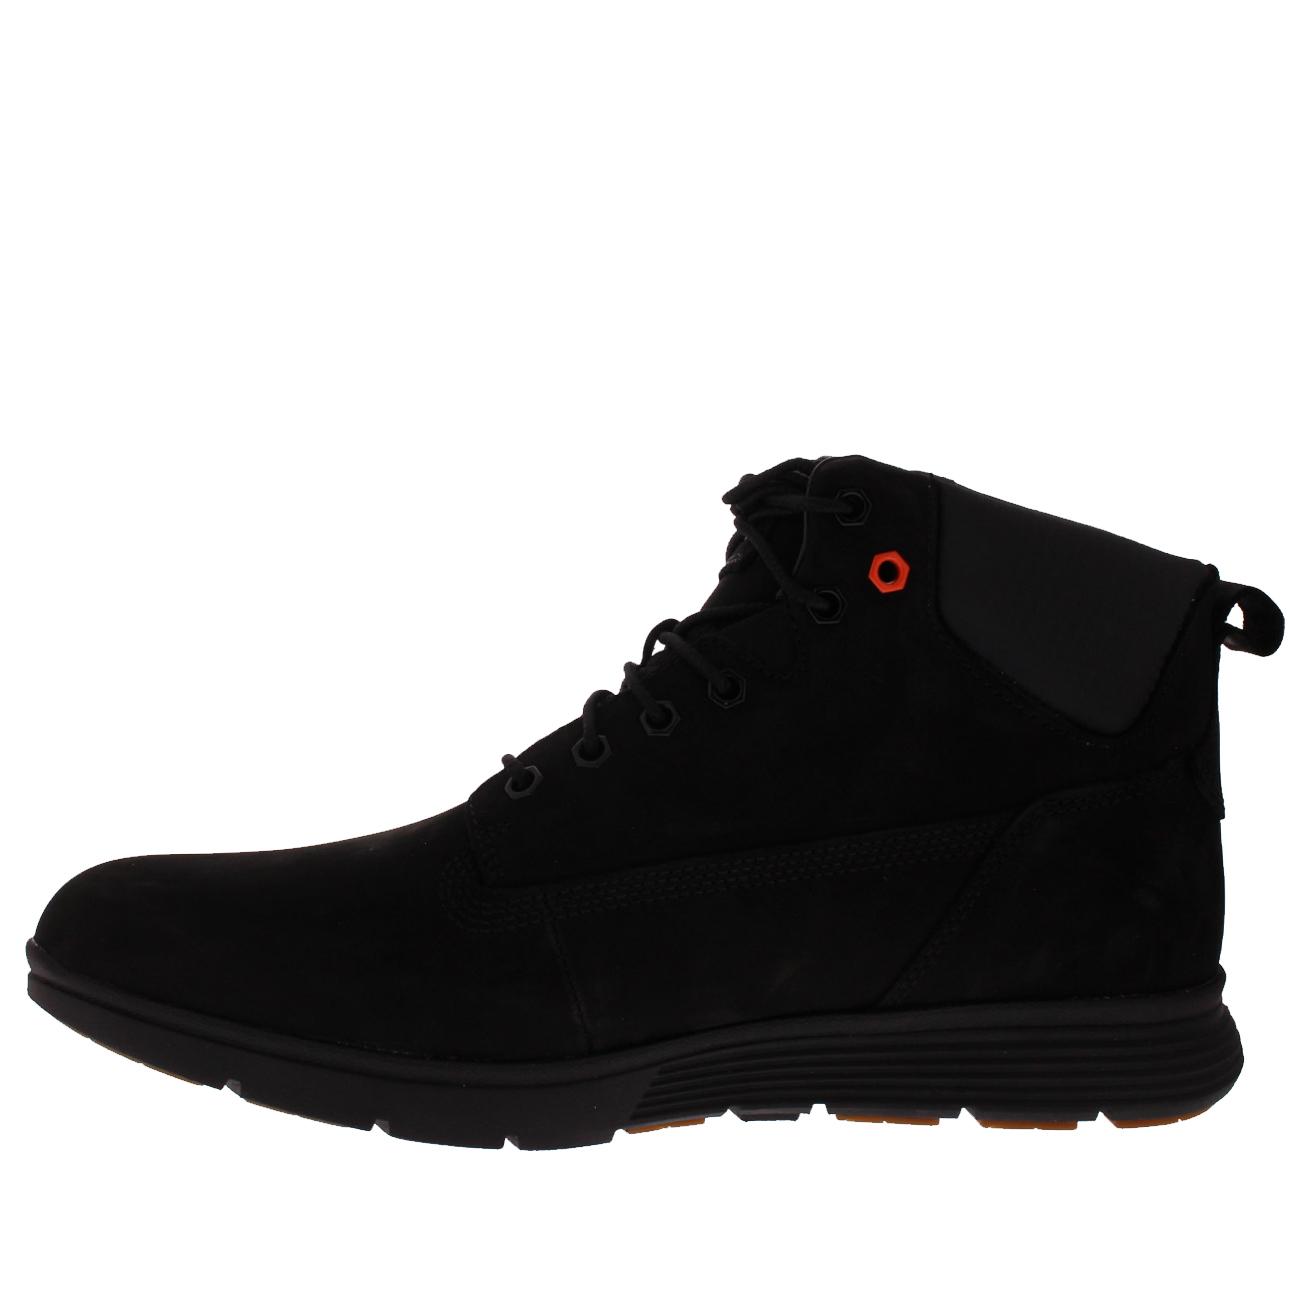 1013f01306ec Details about Mens Timberland Killington Chukka Outdoor Walking Nubuck  Ankle Boots US 6.5-13.5